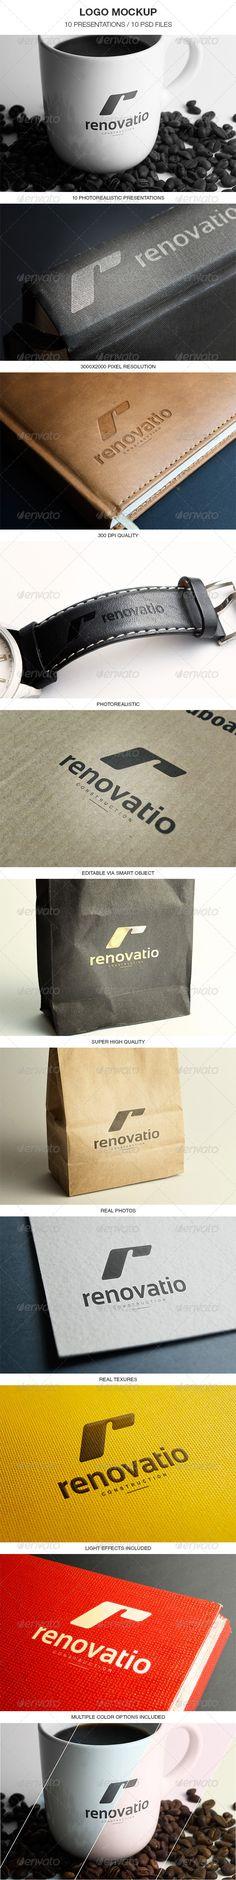 10 Photorealistic Logo Mockups Download here: https://graphicriver.net/item/10-photorealistic-logo-mockups/5099679?ref=KlitVogli